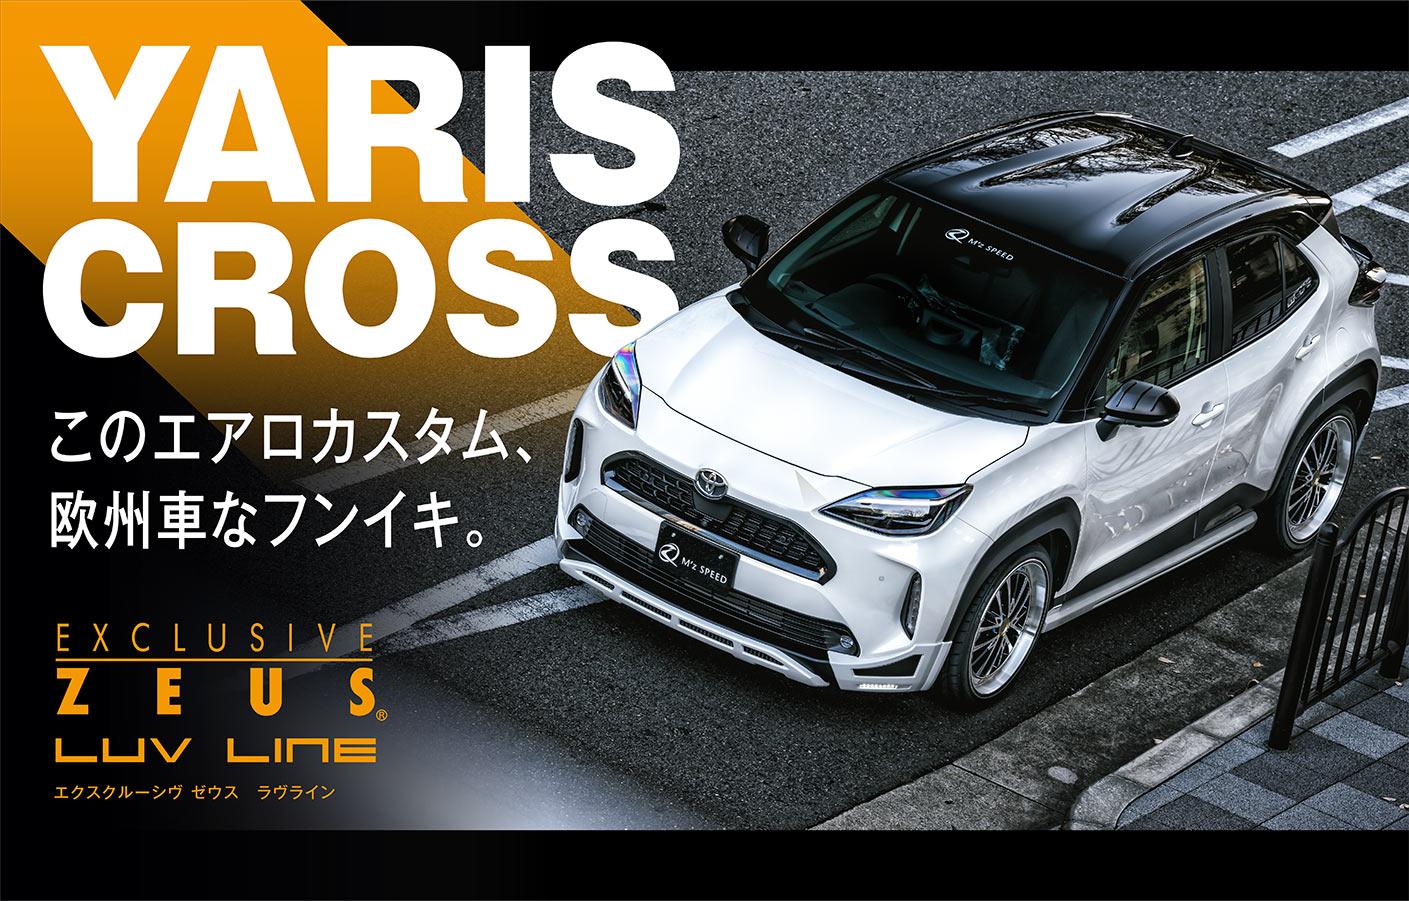 YARIS CROSS このエアロカスタム、 欧州車な雰囲気。EXCLUSIVE ZEUS LUV LINE エクスクルーシヴ ゼウス ラブライン